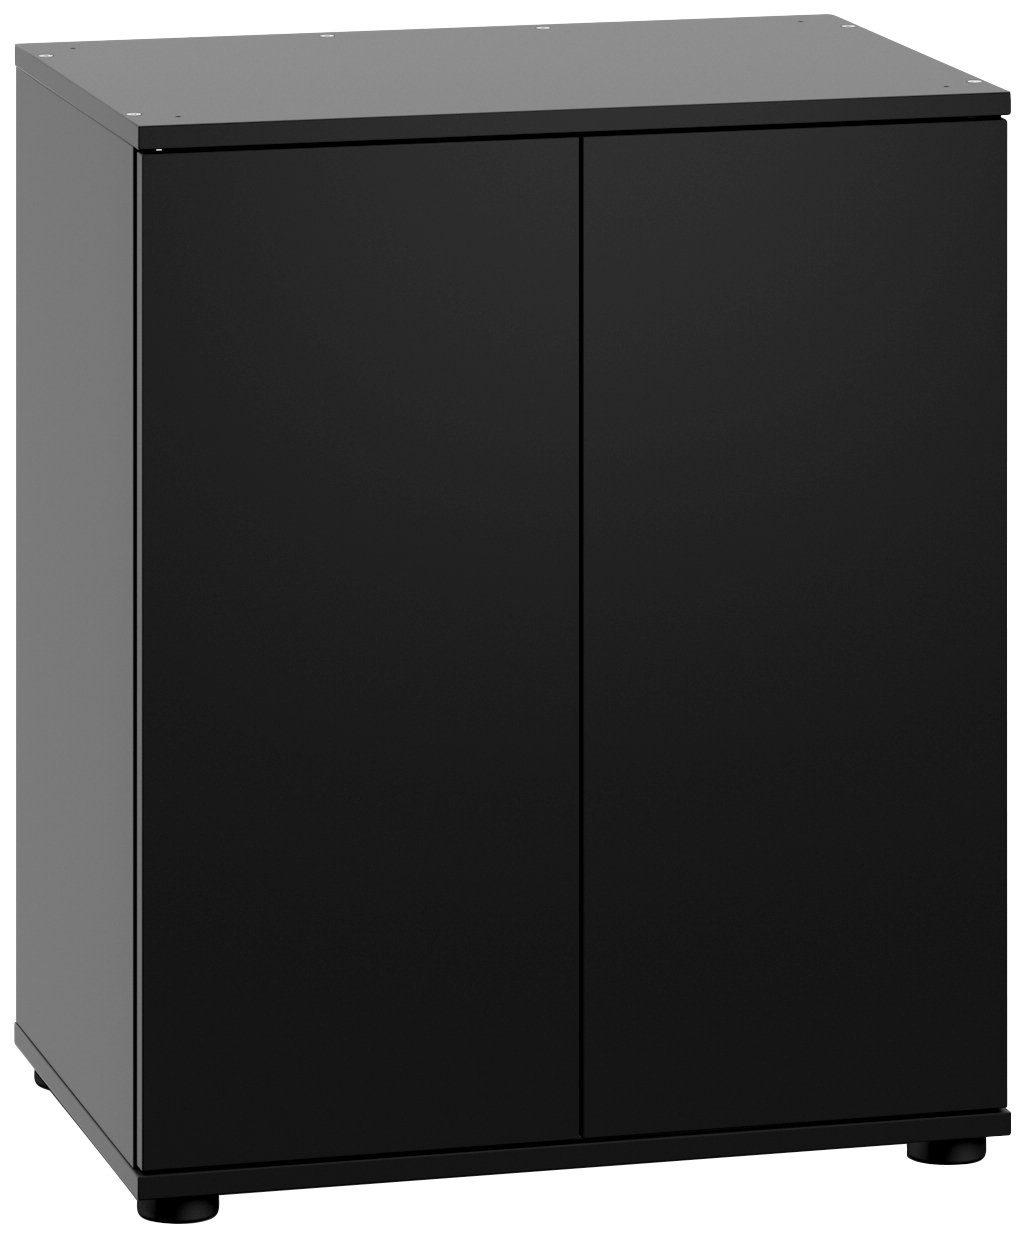 Aquarien-Unterschrank »SBX Lido 120«, BxTxH: 61x41x73 cm, schwarz